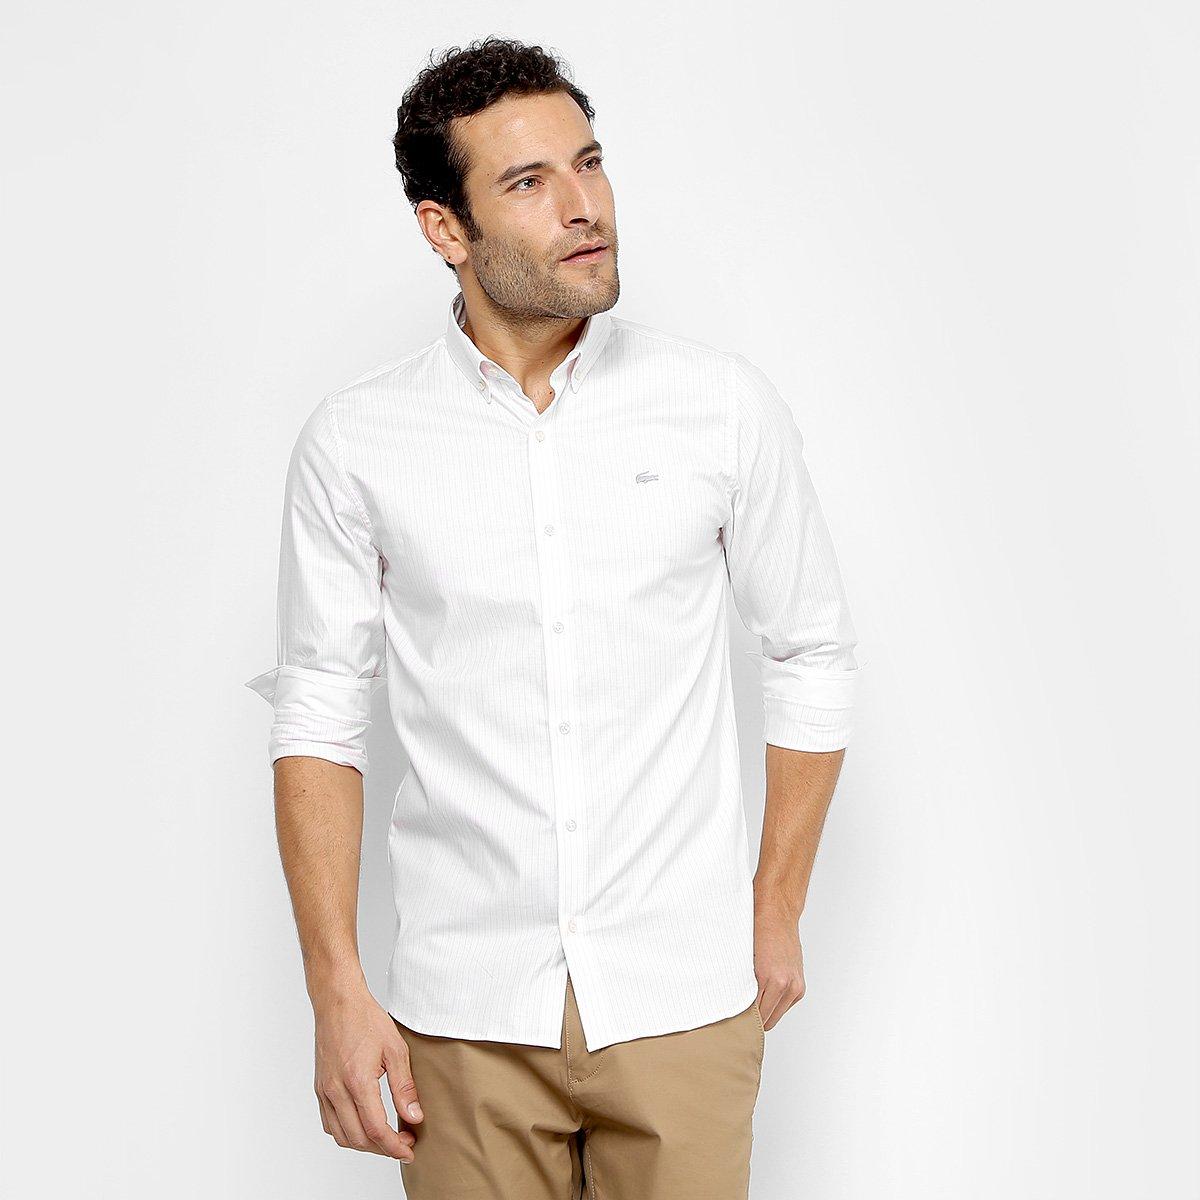 Camisa Lacoste Slim Listras Manga Longa Masculina - Rosa Claro ...  62778738cb5080  Camiseta Lacoste Un Crocodile Masculina - Compre Agora  Zattini ... 91578cace5